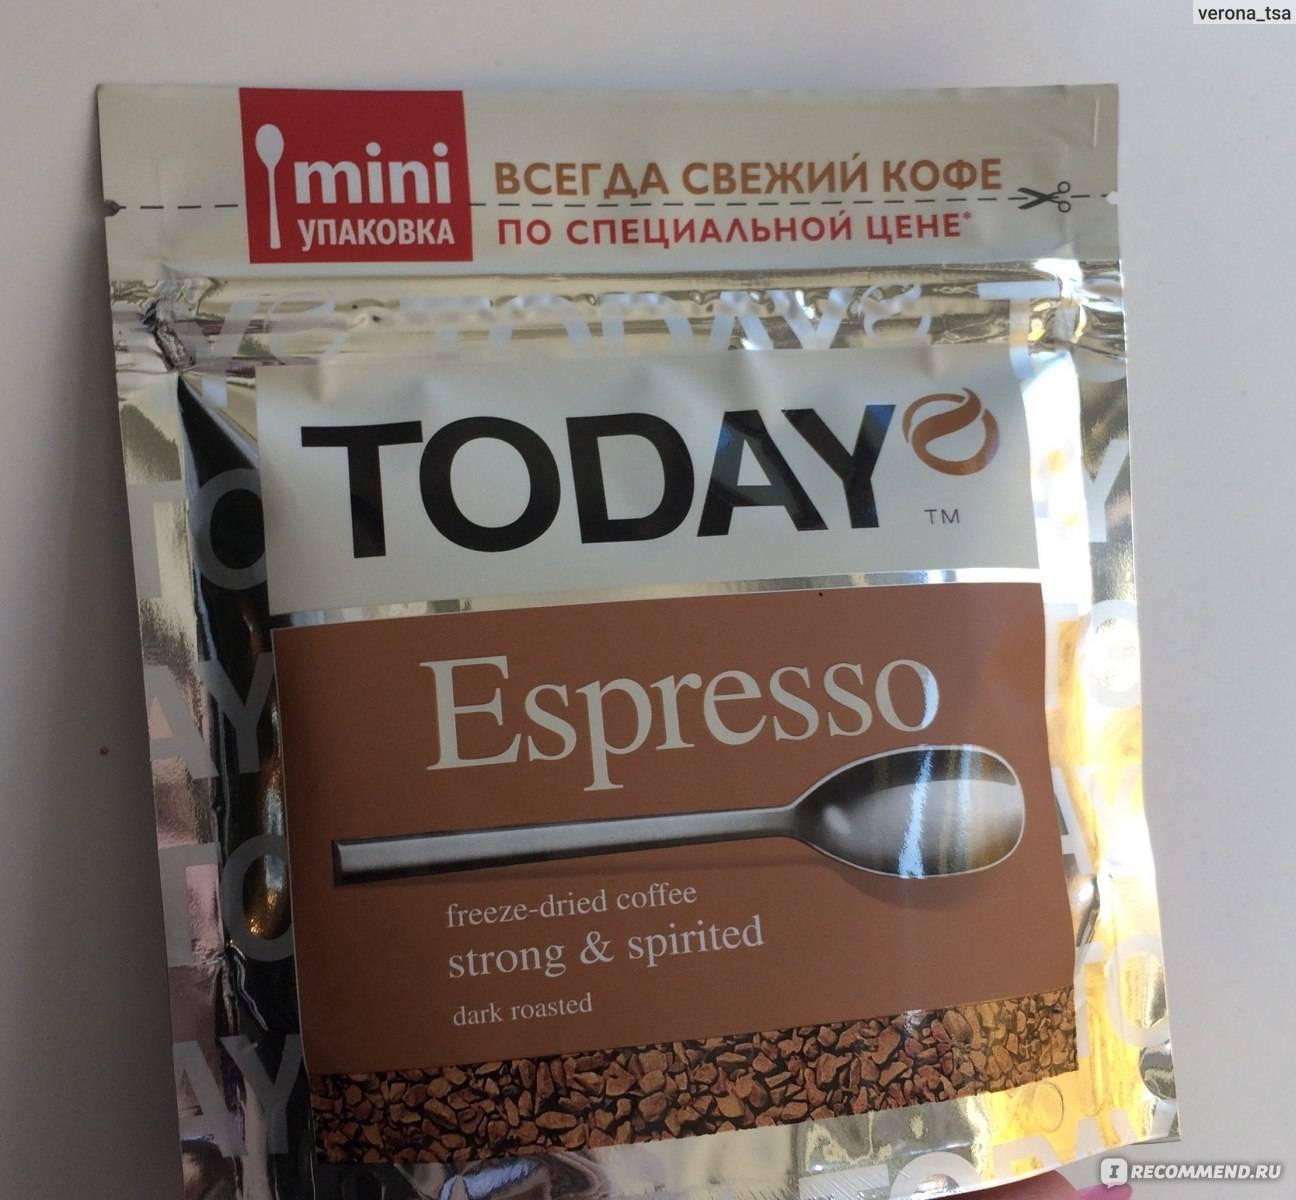 Кофе today pure arabica: отзывы о бренде тудей арабика, ассортимент